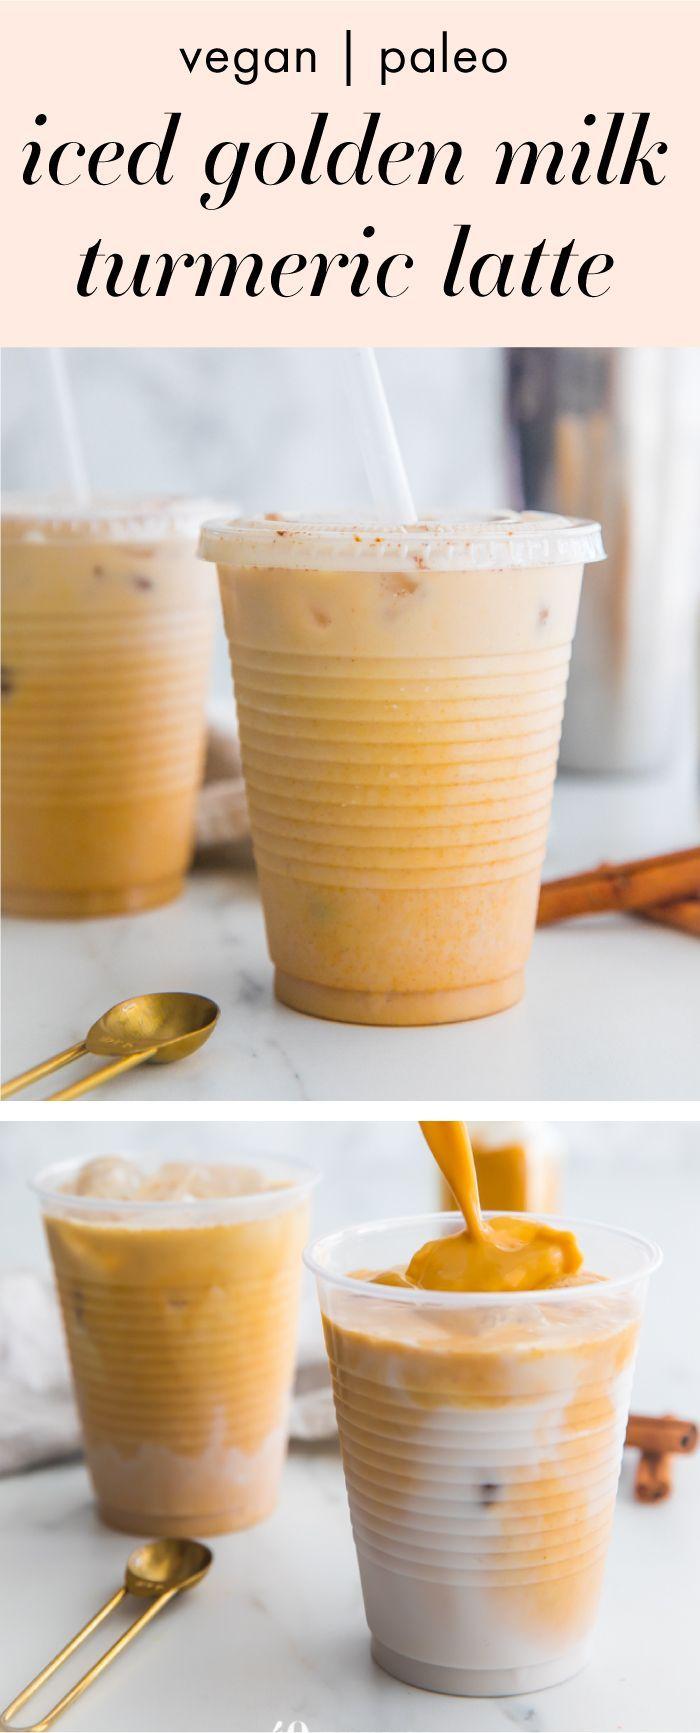 Iced Golden Milk Latte (Paleo, Vegan)   – Vegan & Vegetarian